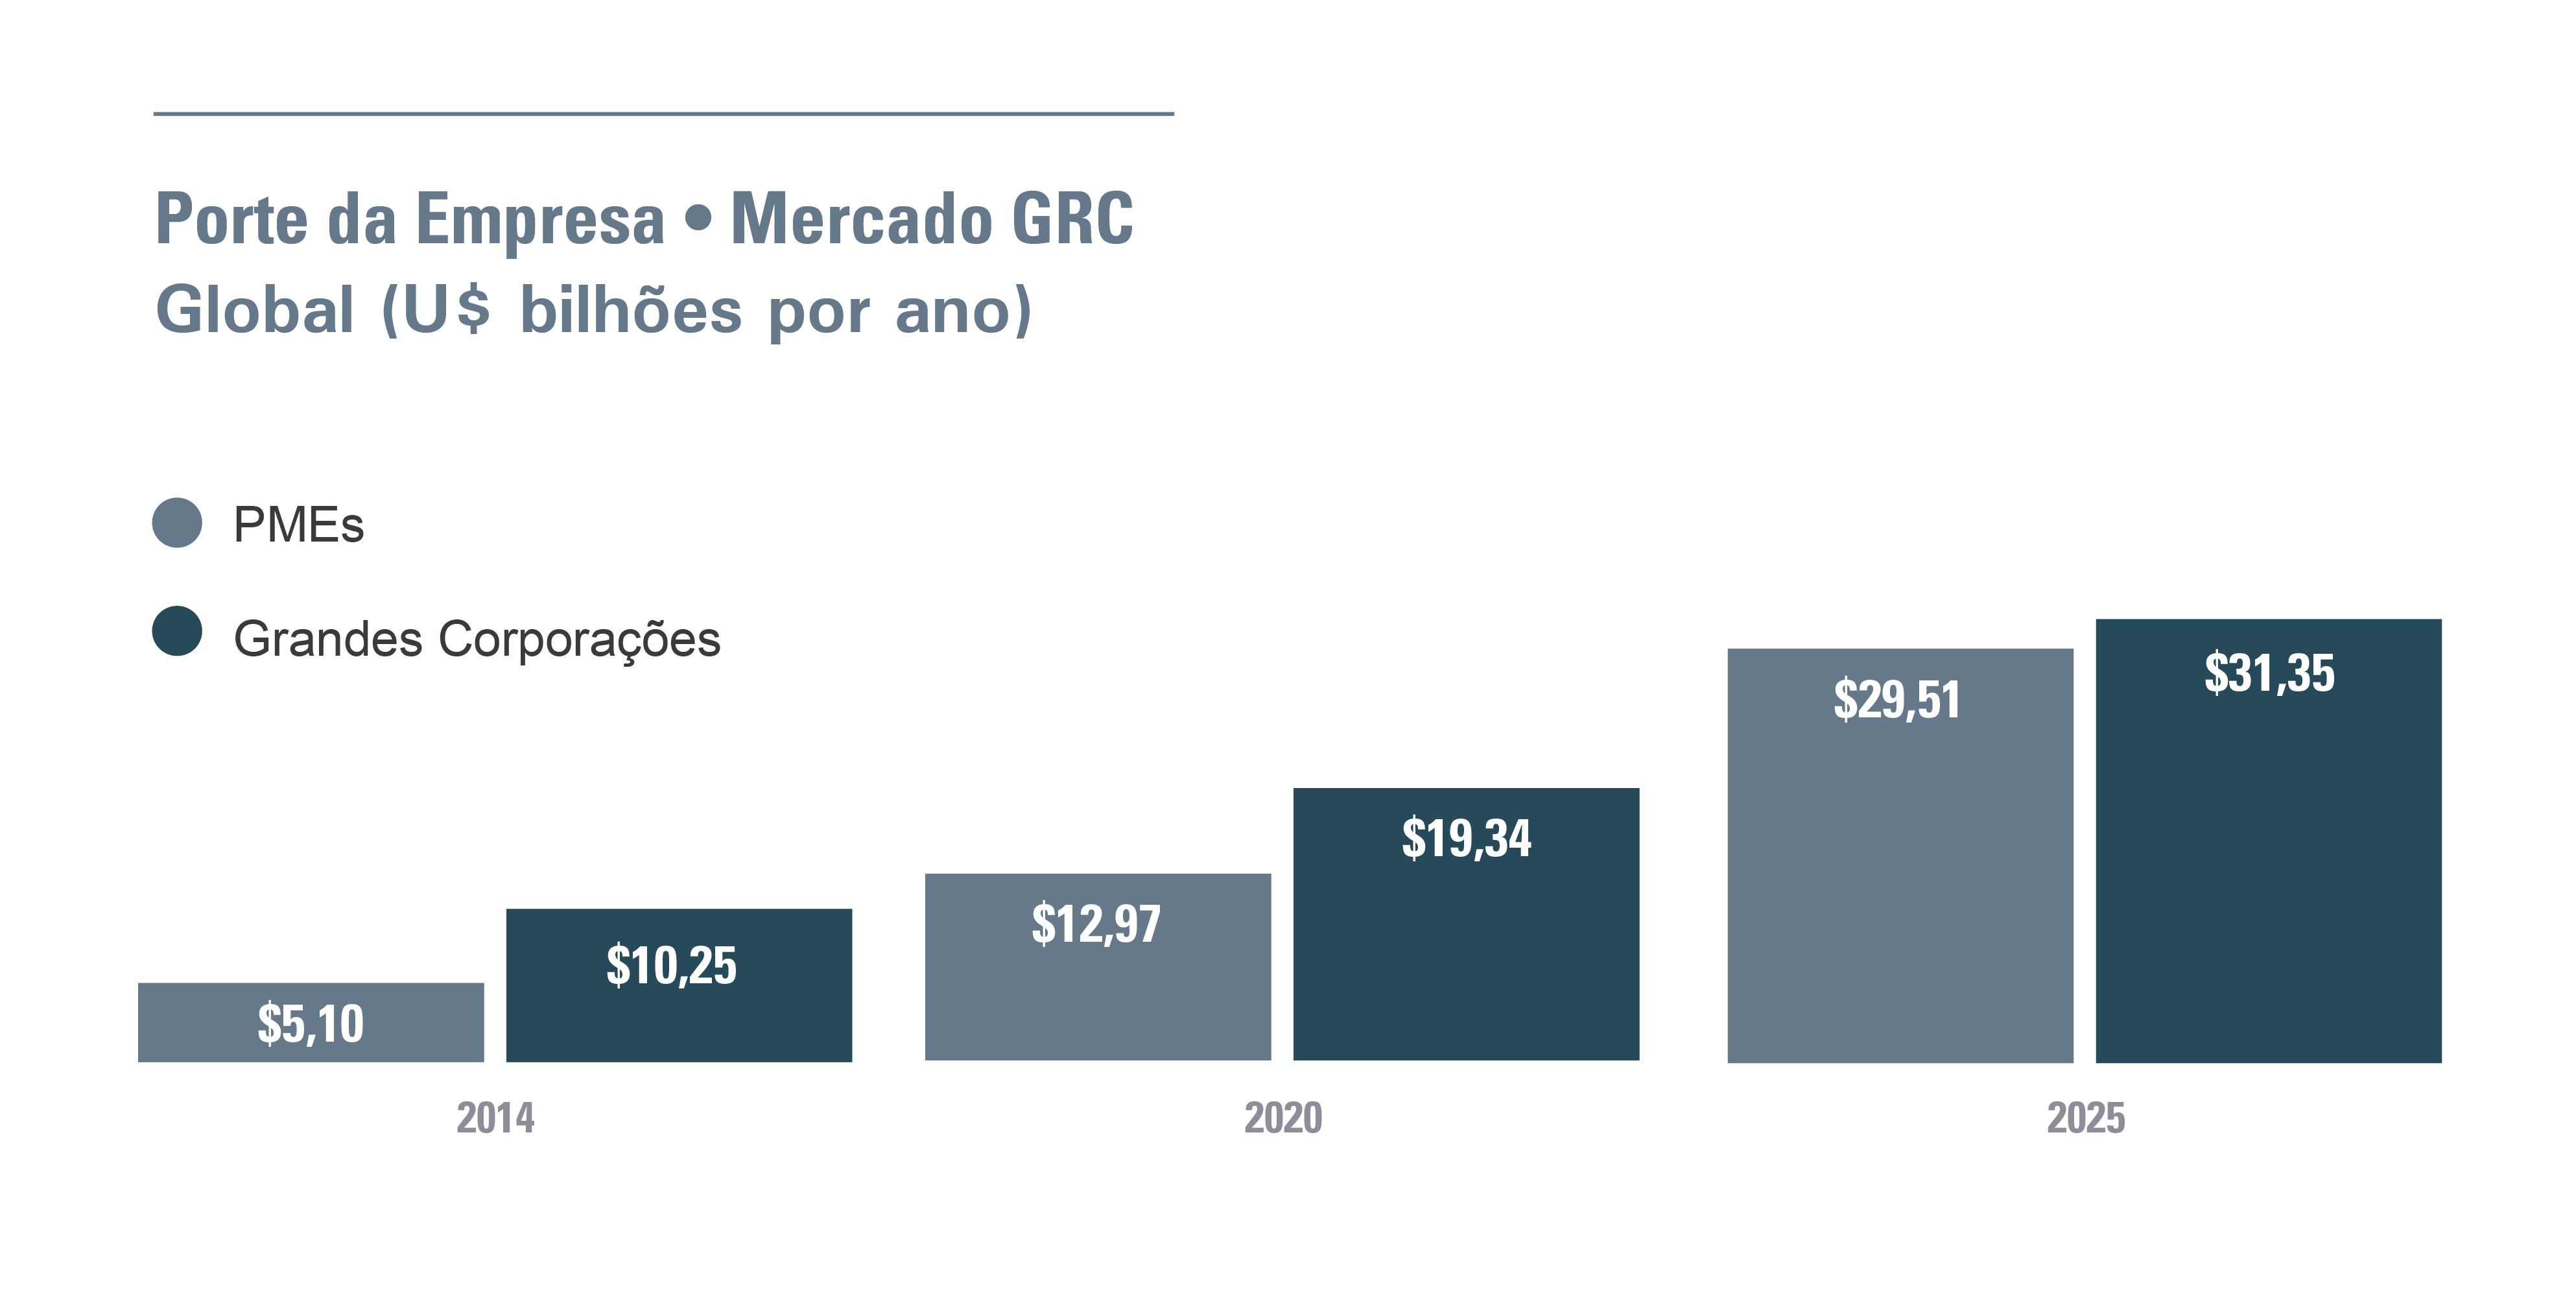 gráfico grandes corporações versus PMEs mercado GRC